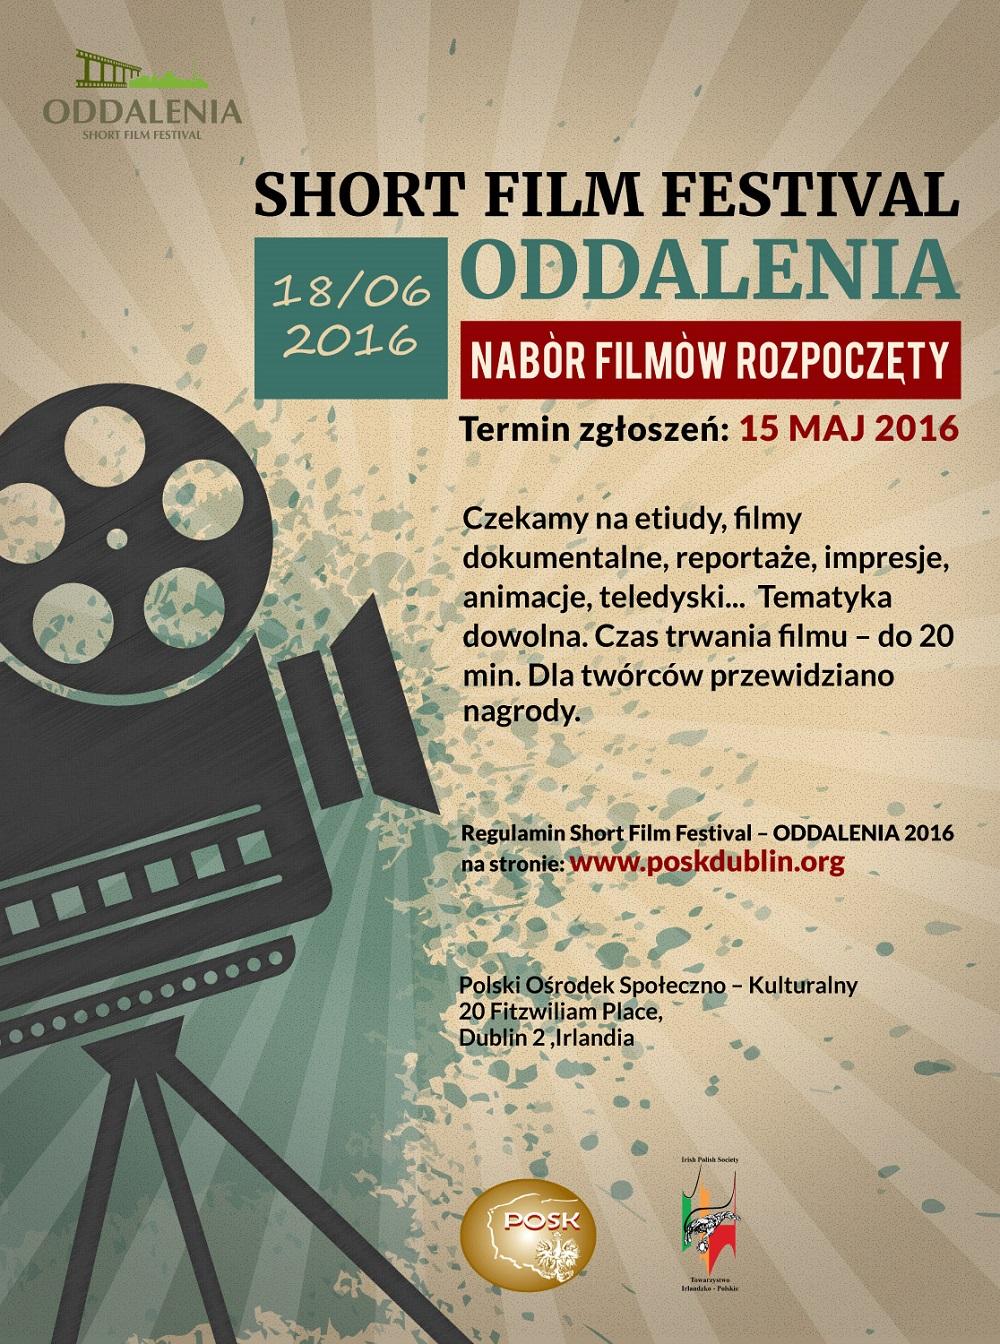 Oddalenia 2016 - SHORT FILM FESTIVAL